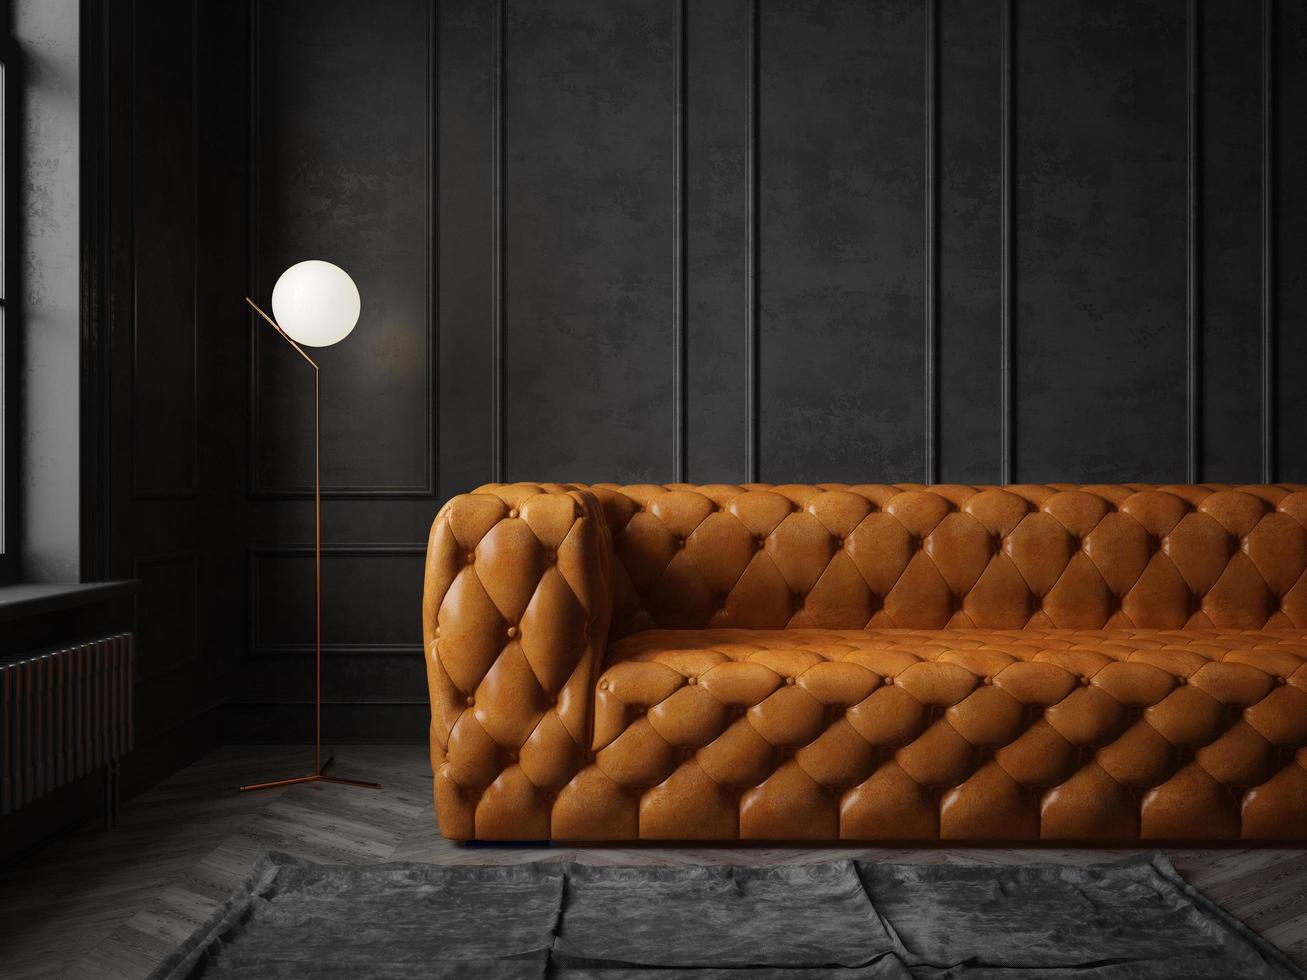 Black colored conceptual interior room in 3D illustration photo